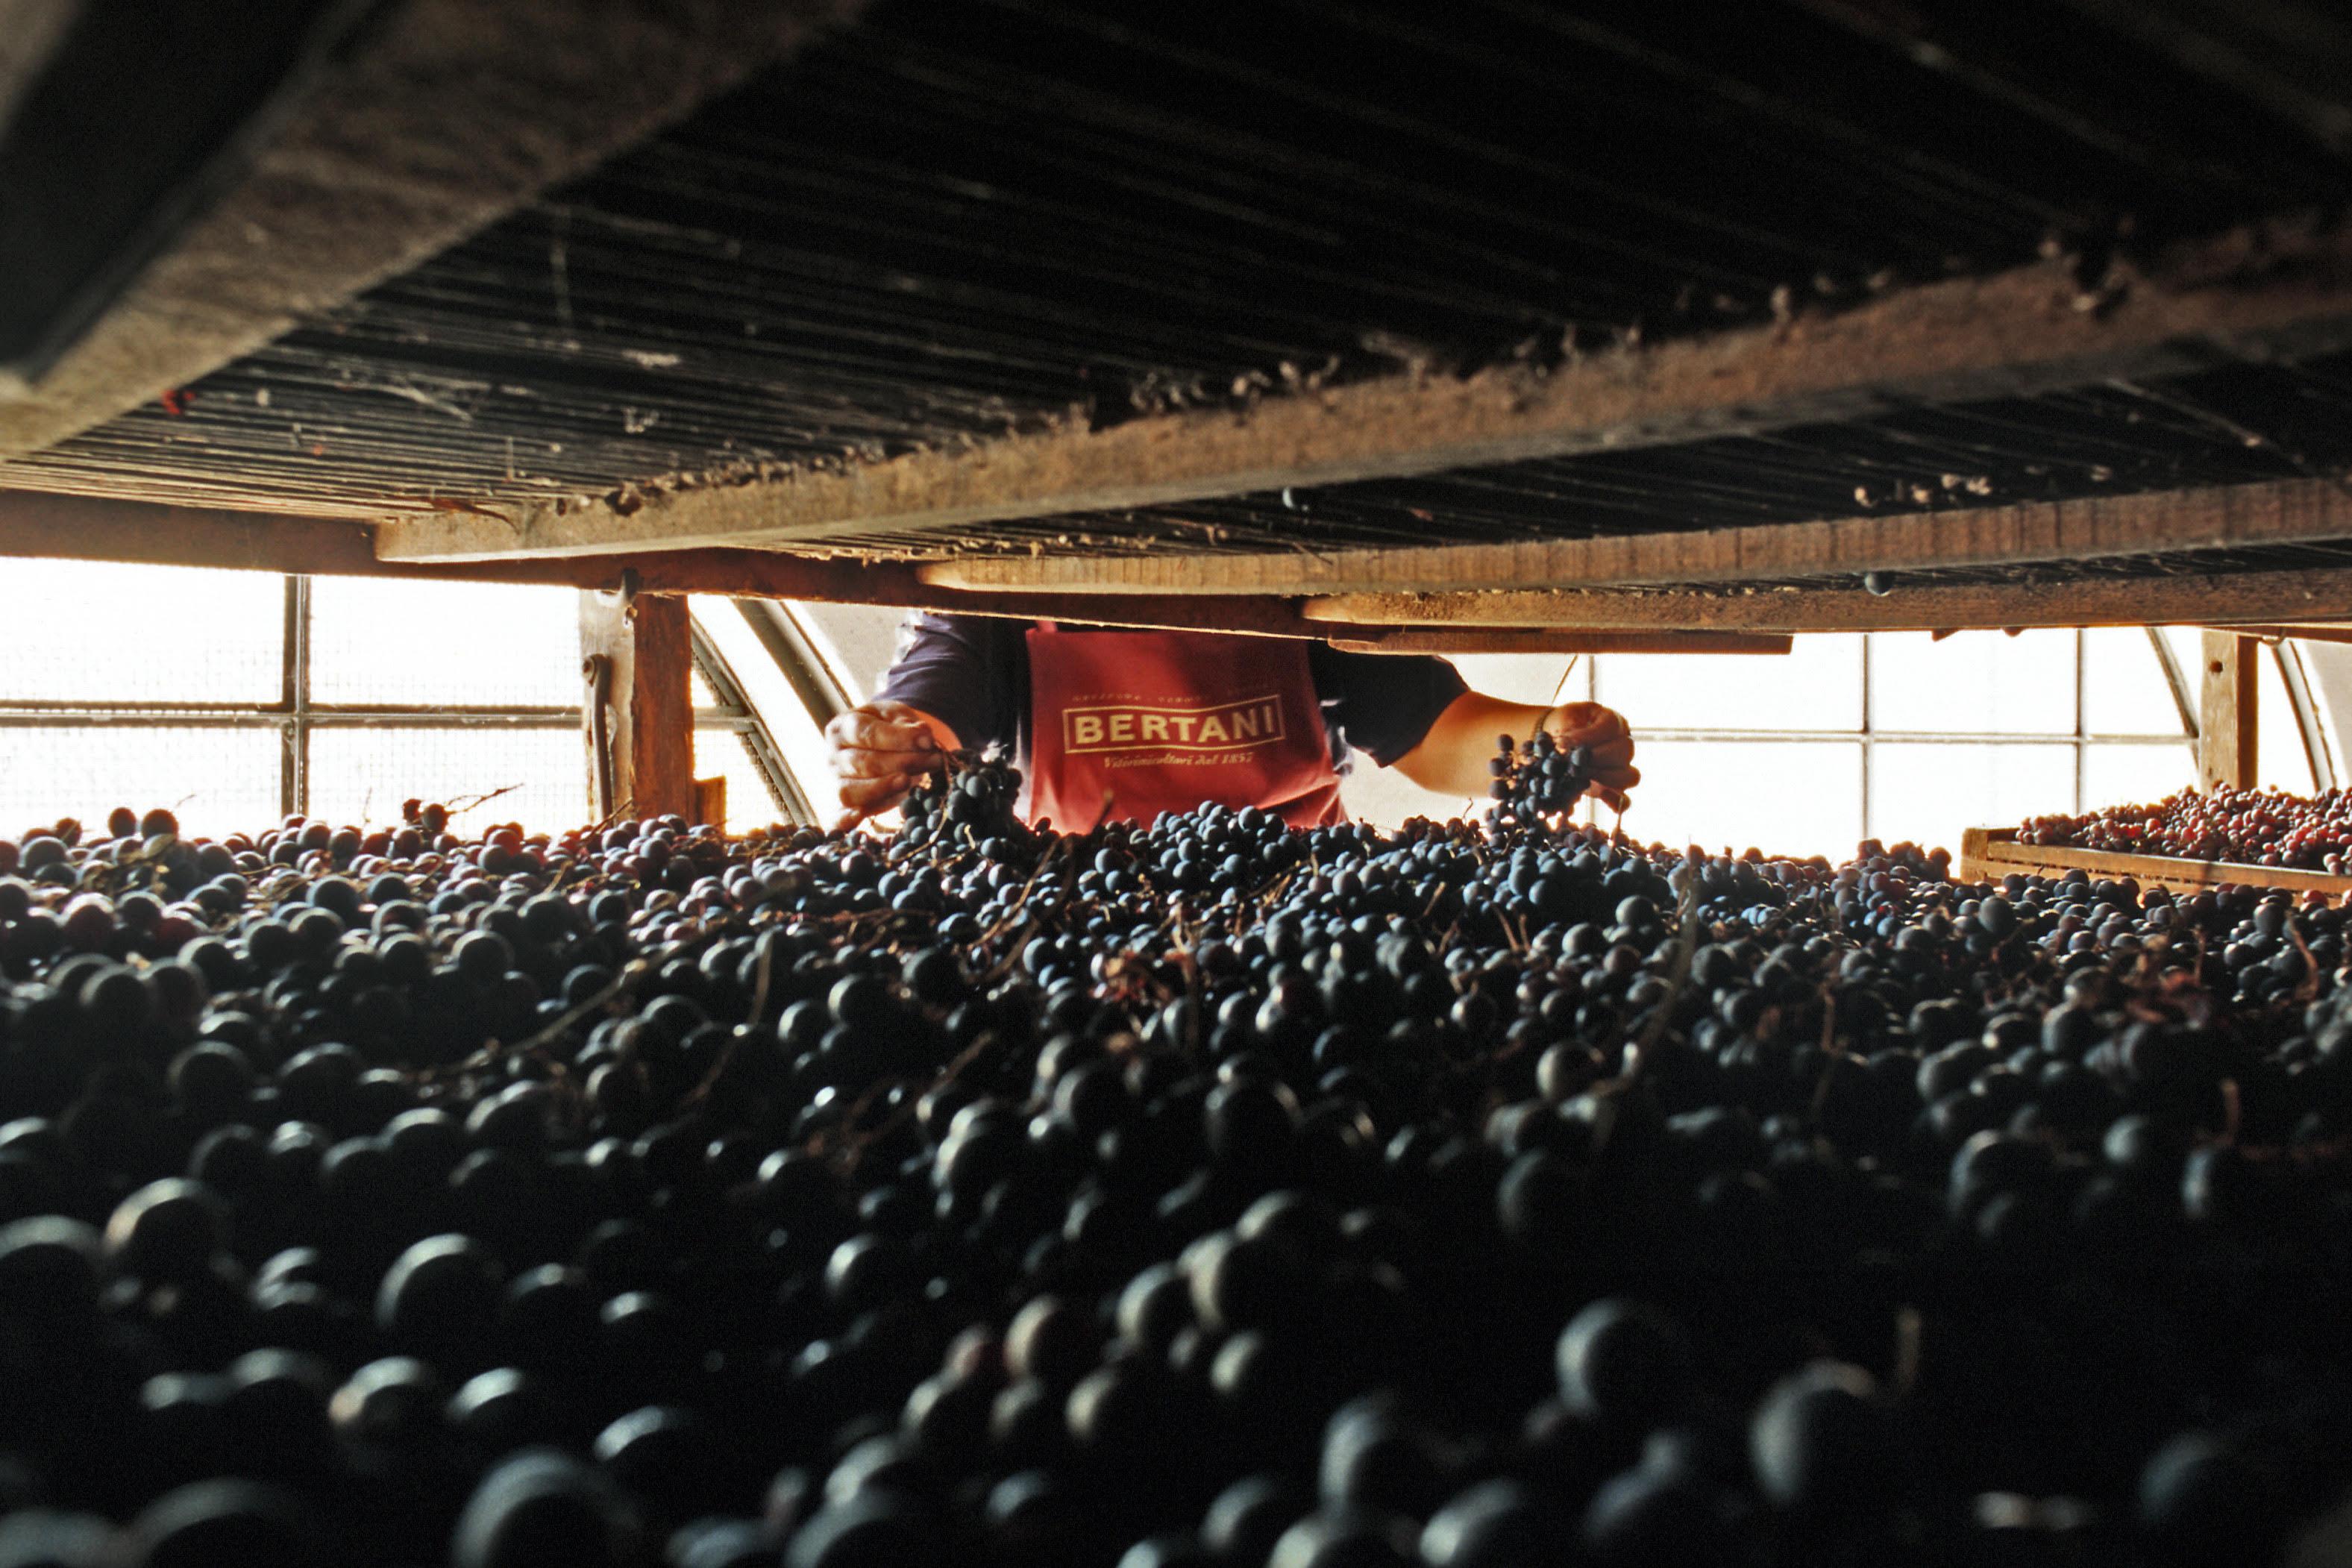 Bertani-drying-lofts-amarone-apassimento